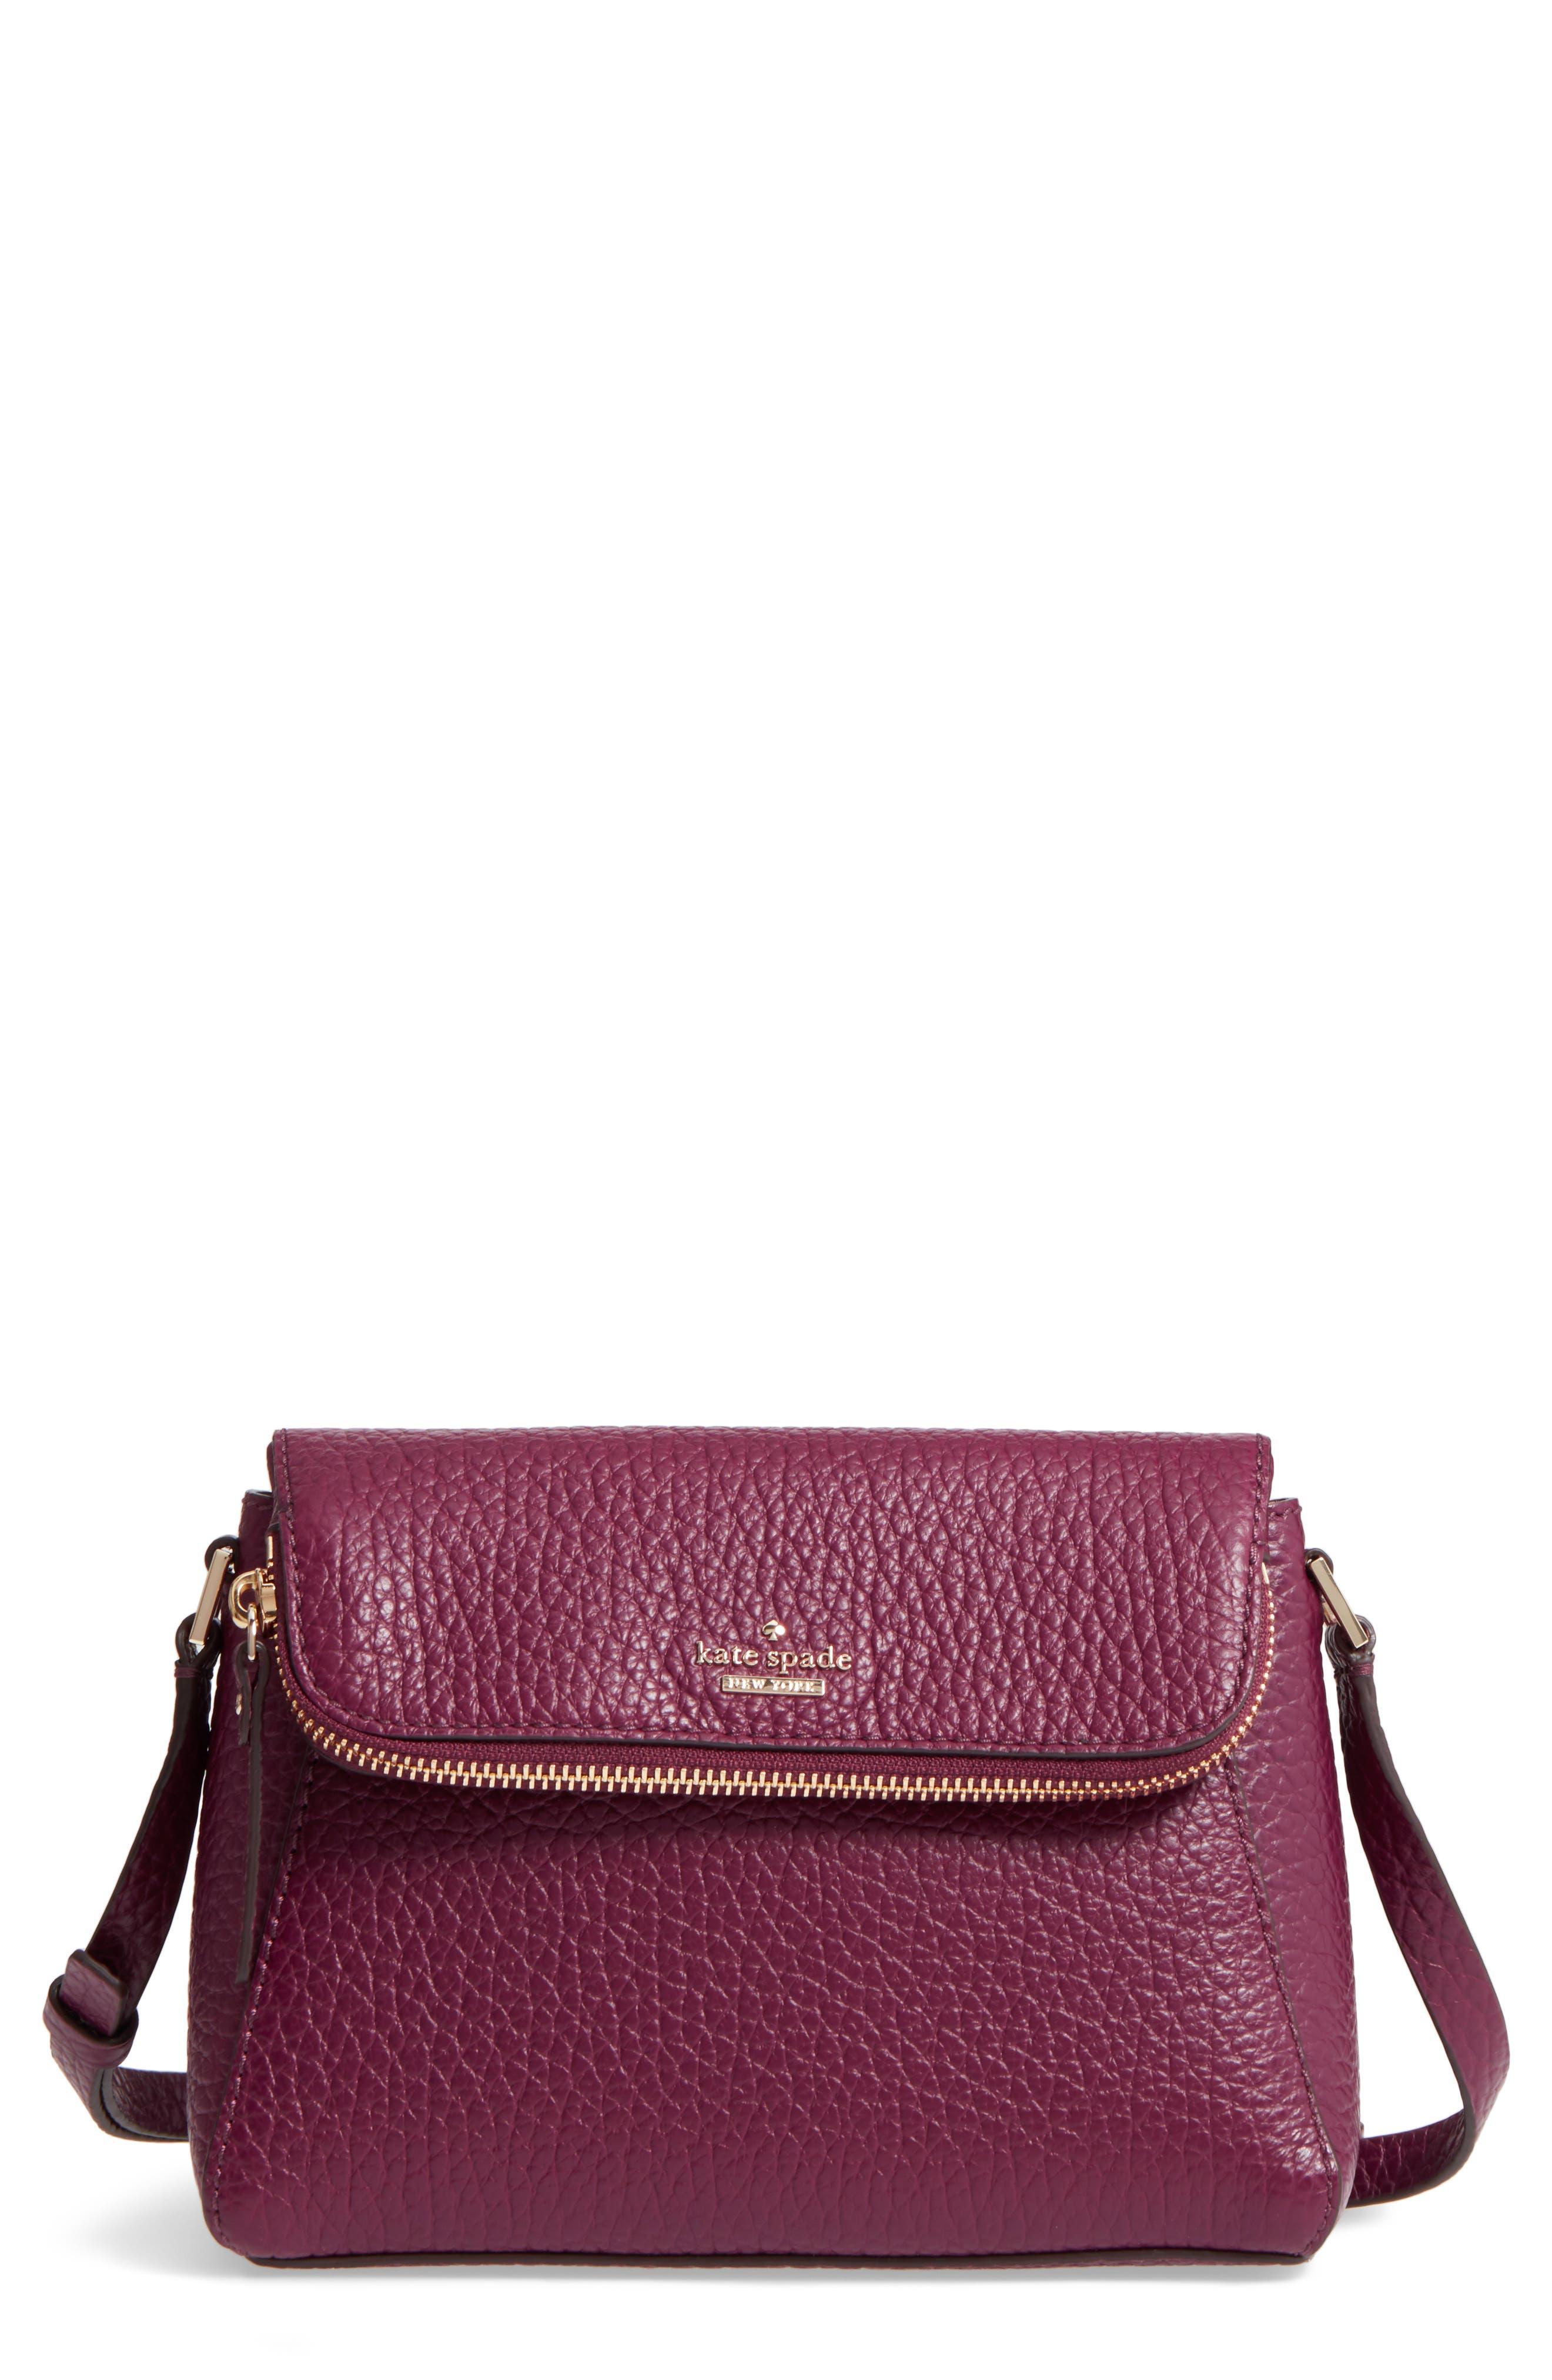 carter street - berrin leather crossbody bag,                         Main,                         color, Plum